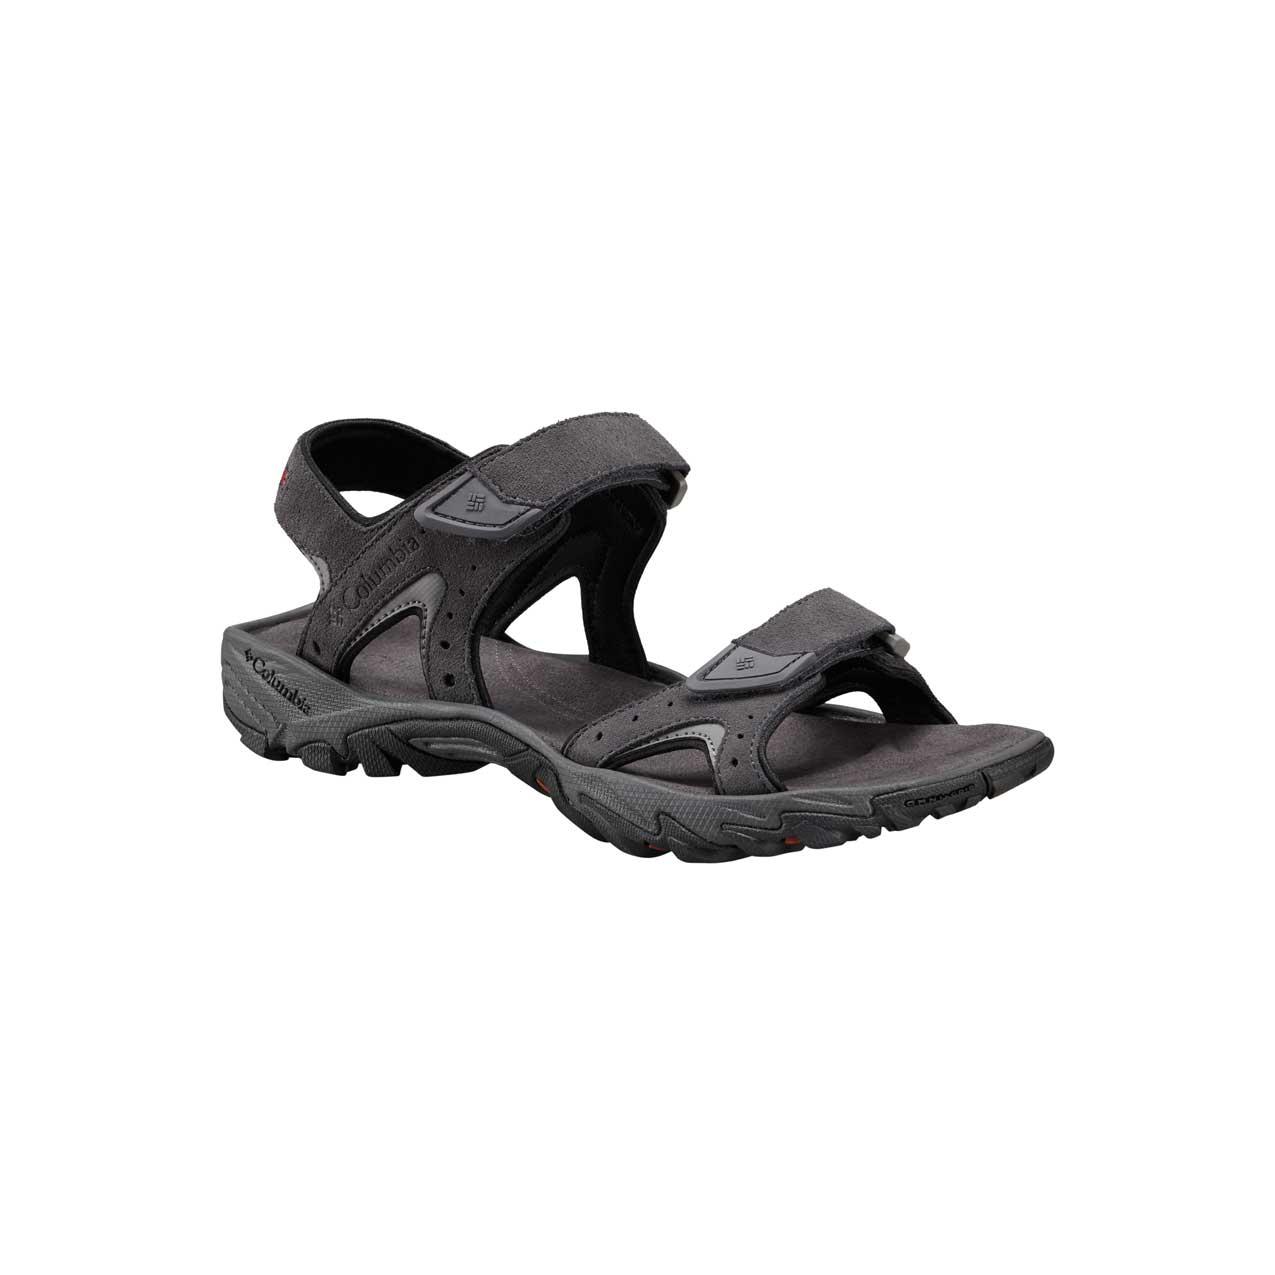 Sandali COLUMBIA - Santiam 2 Strap BM4624 Dark Grey/Rusty 089 dB74y9